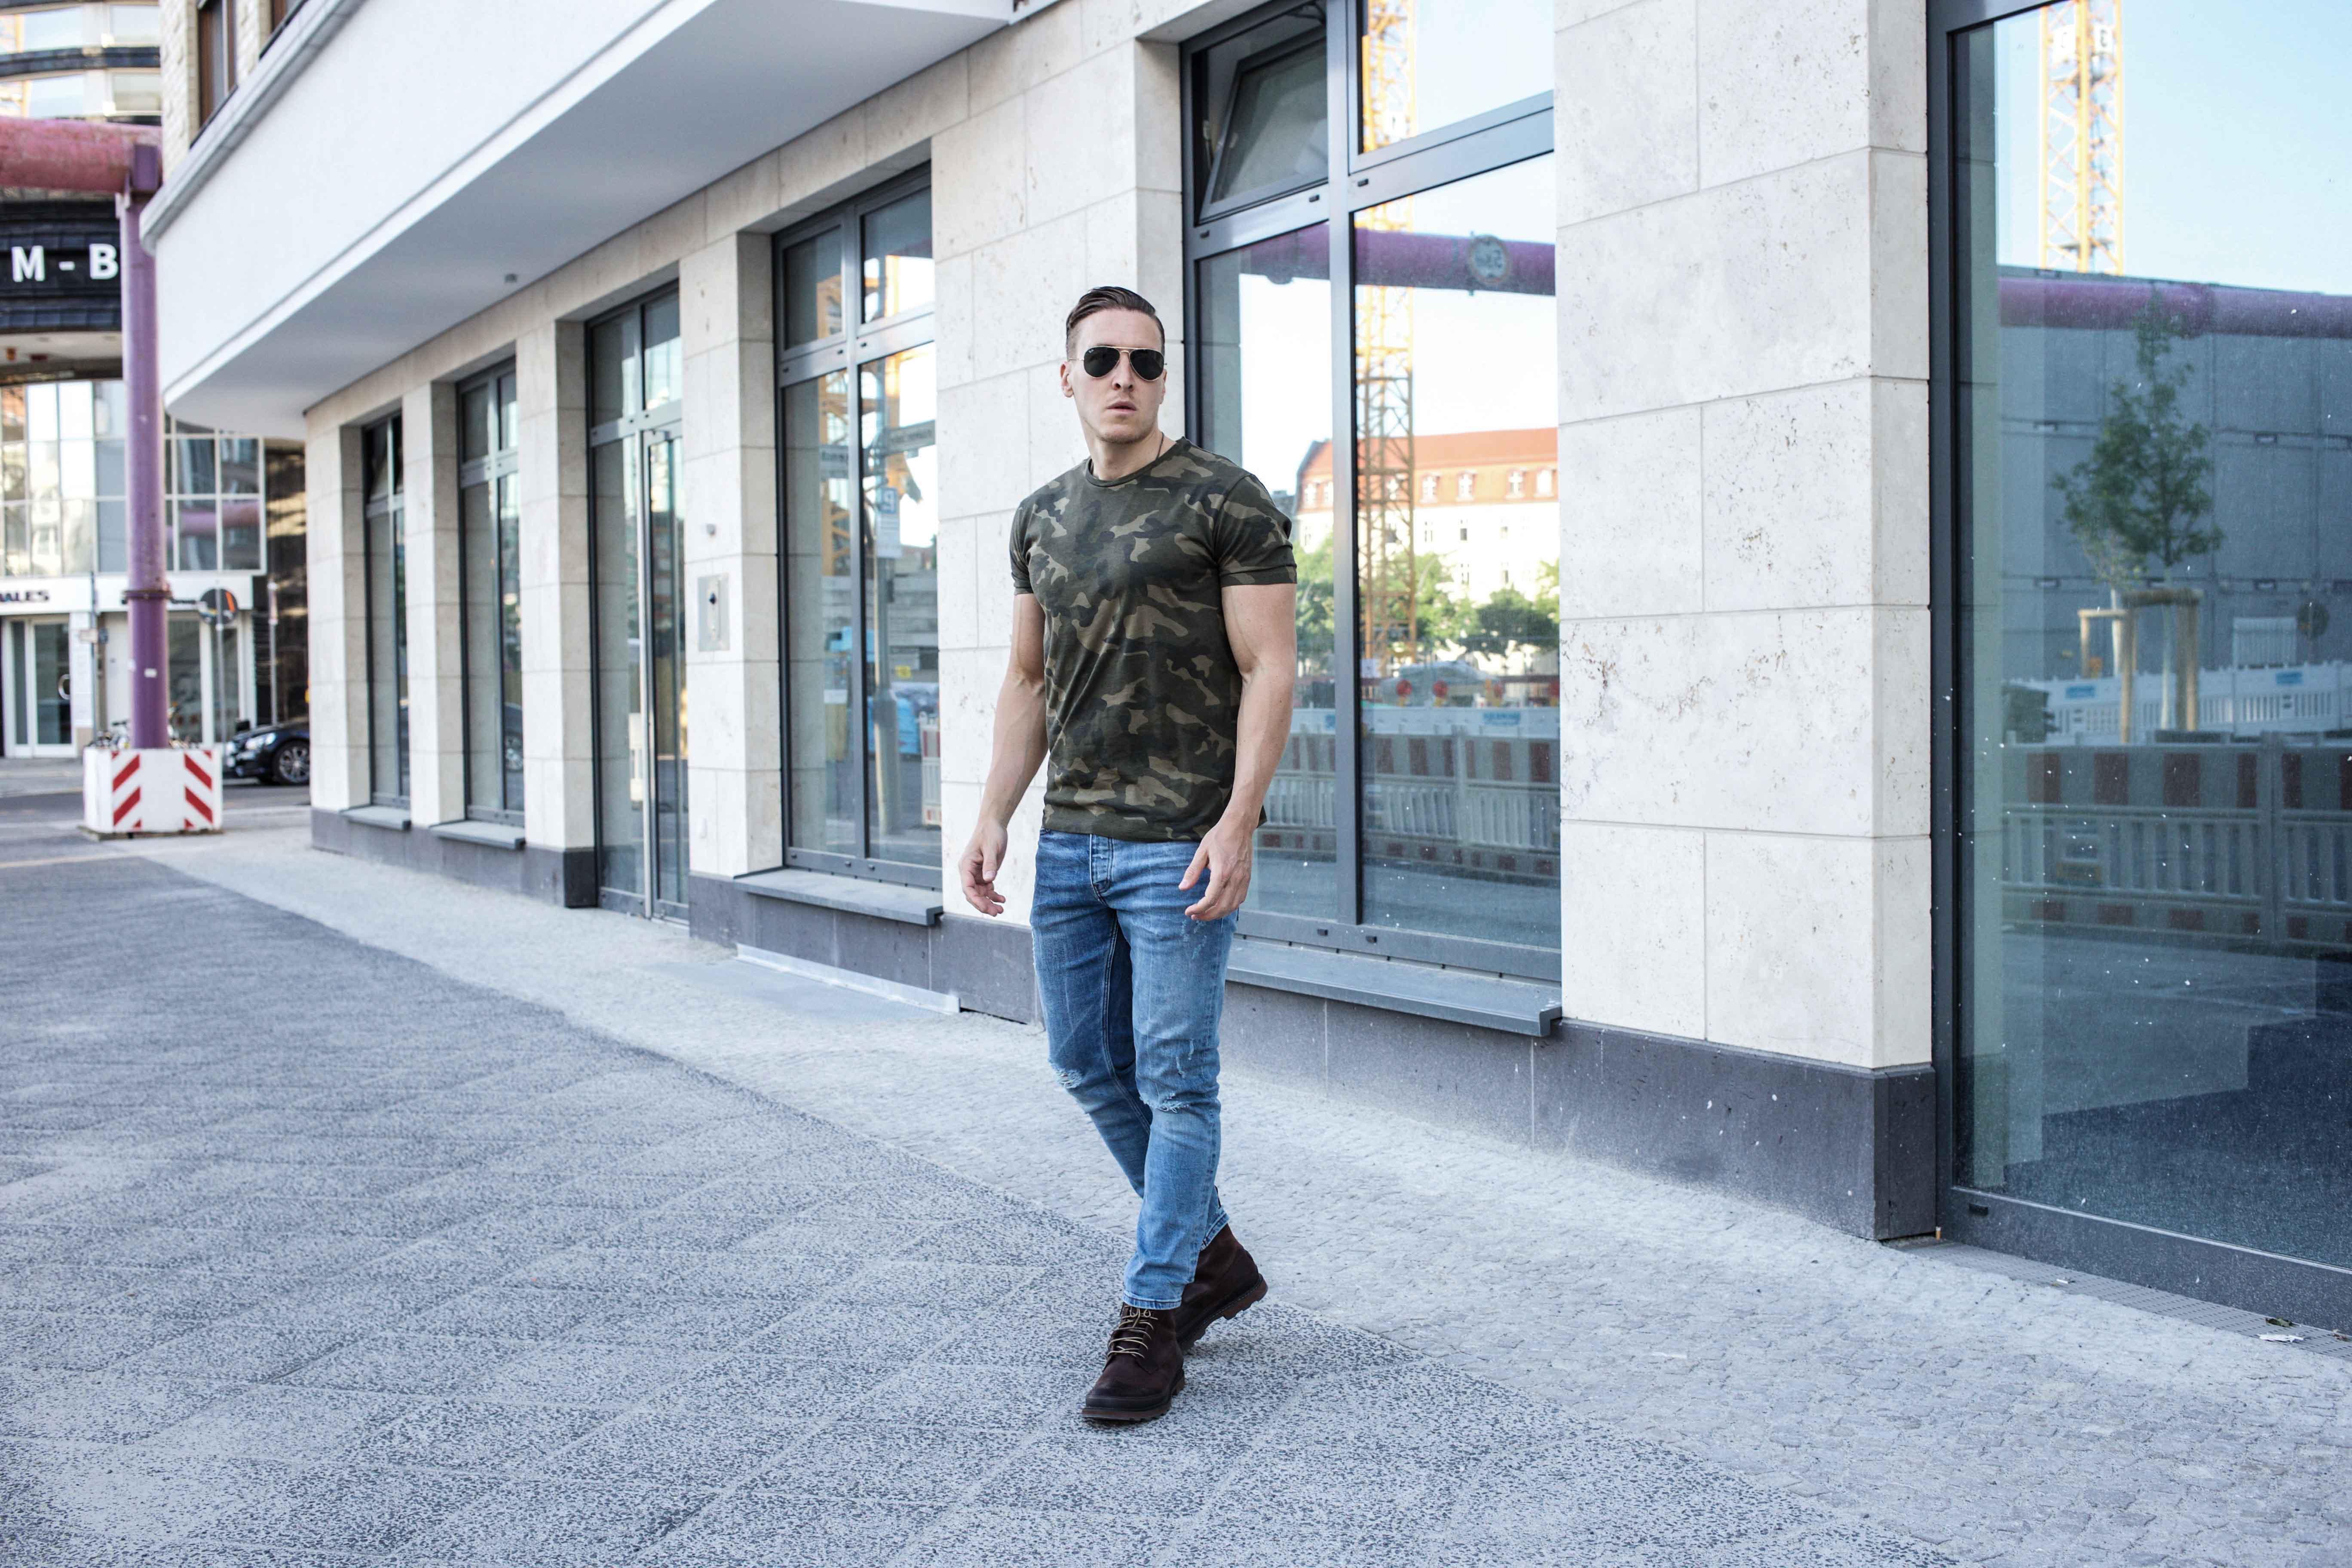 camouflage-braun-erdtöne-boots-ripped-jeans-männer-lifestyle-modeblog_6886